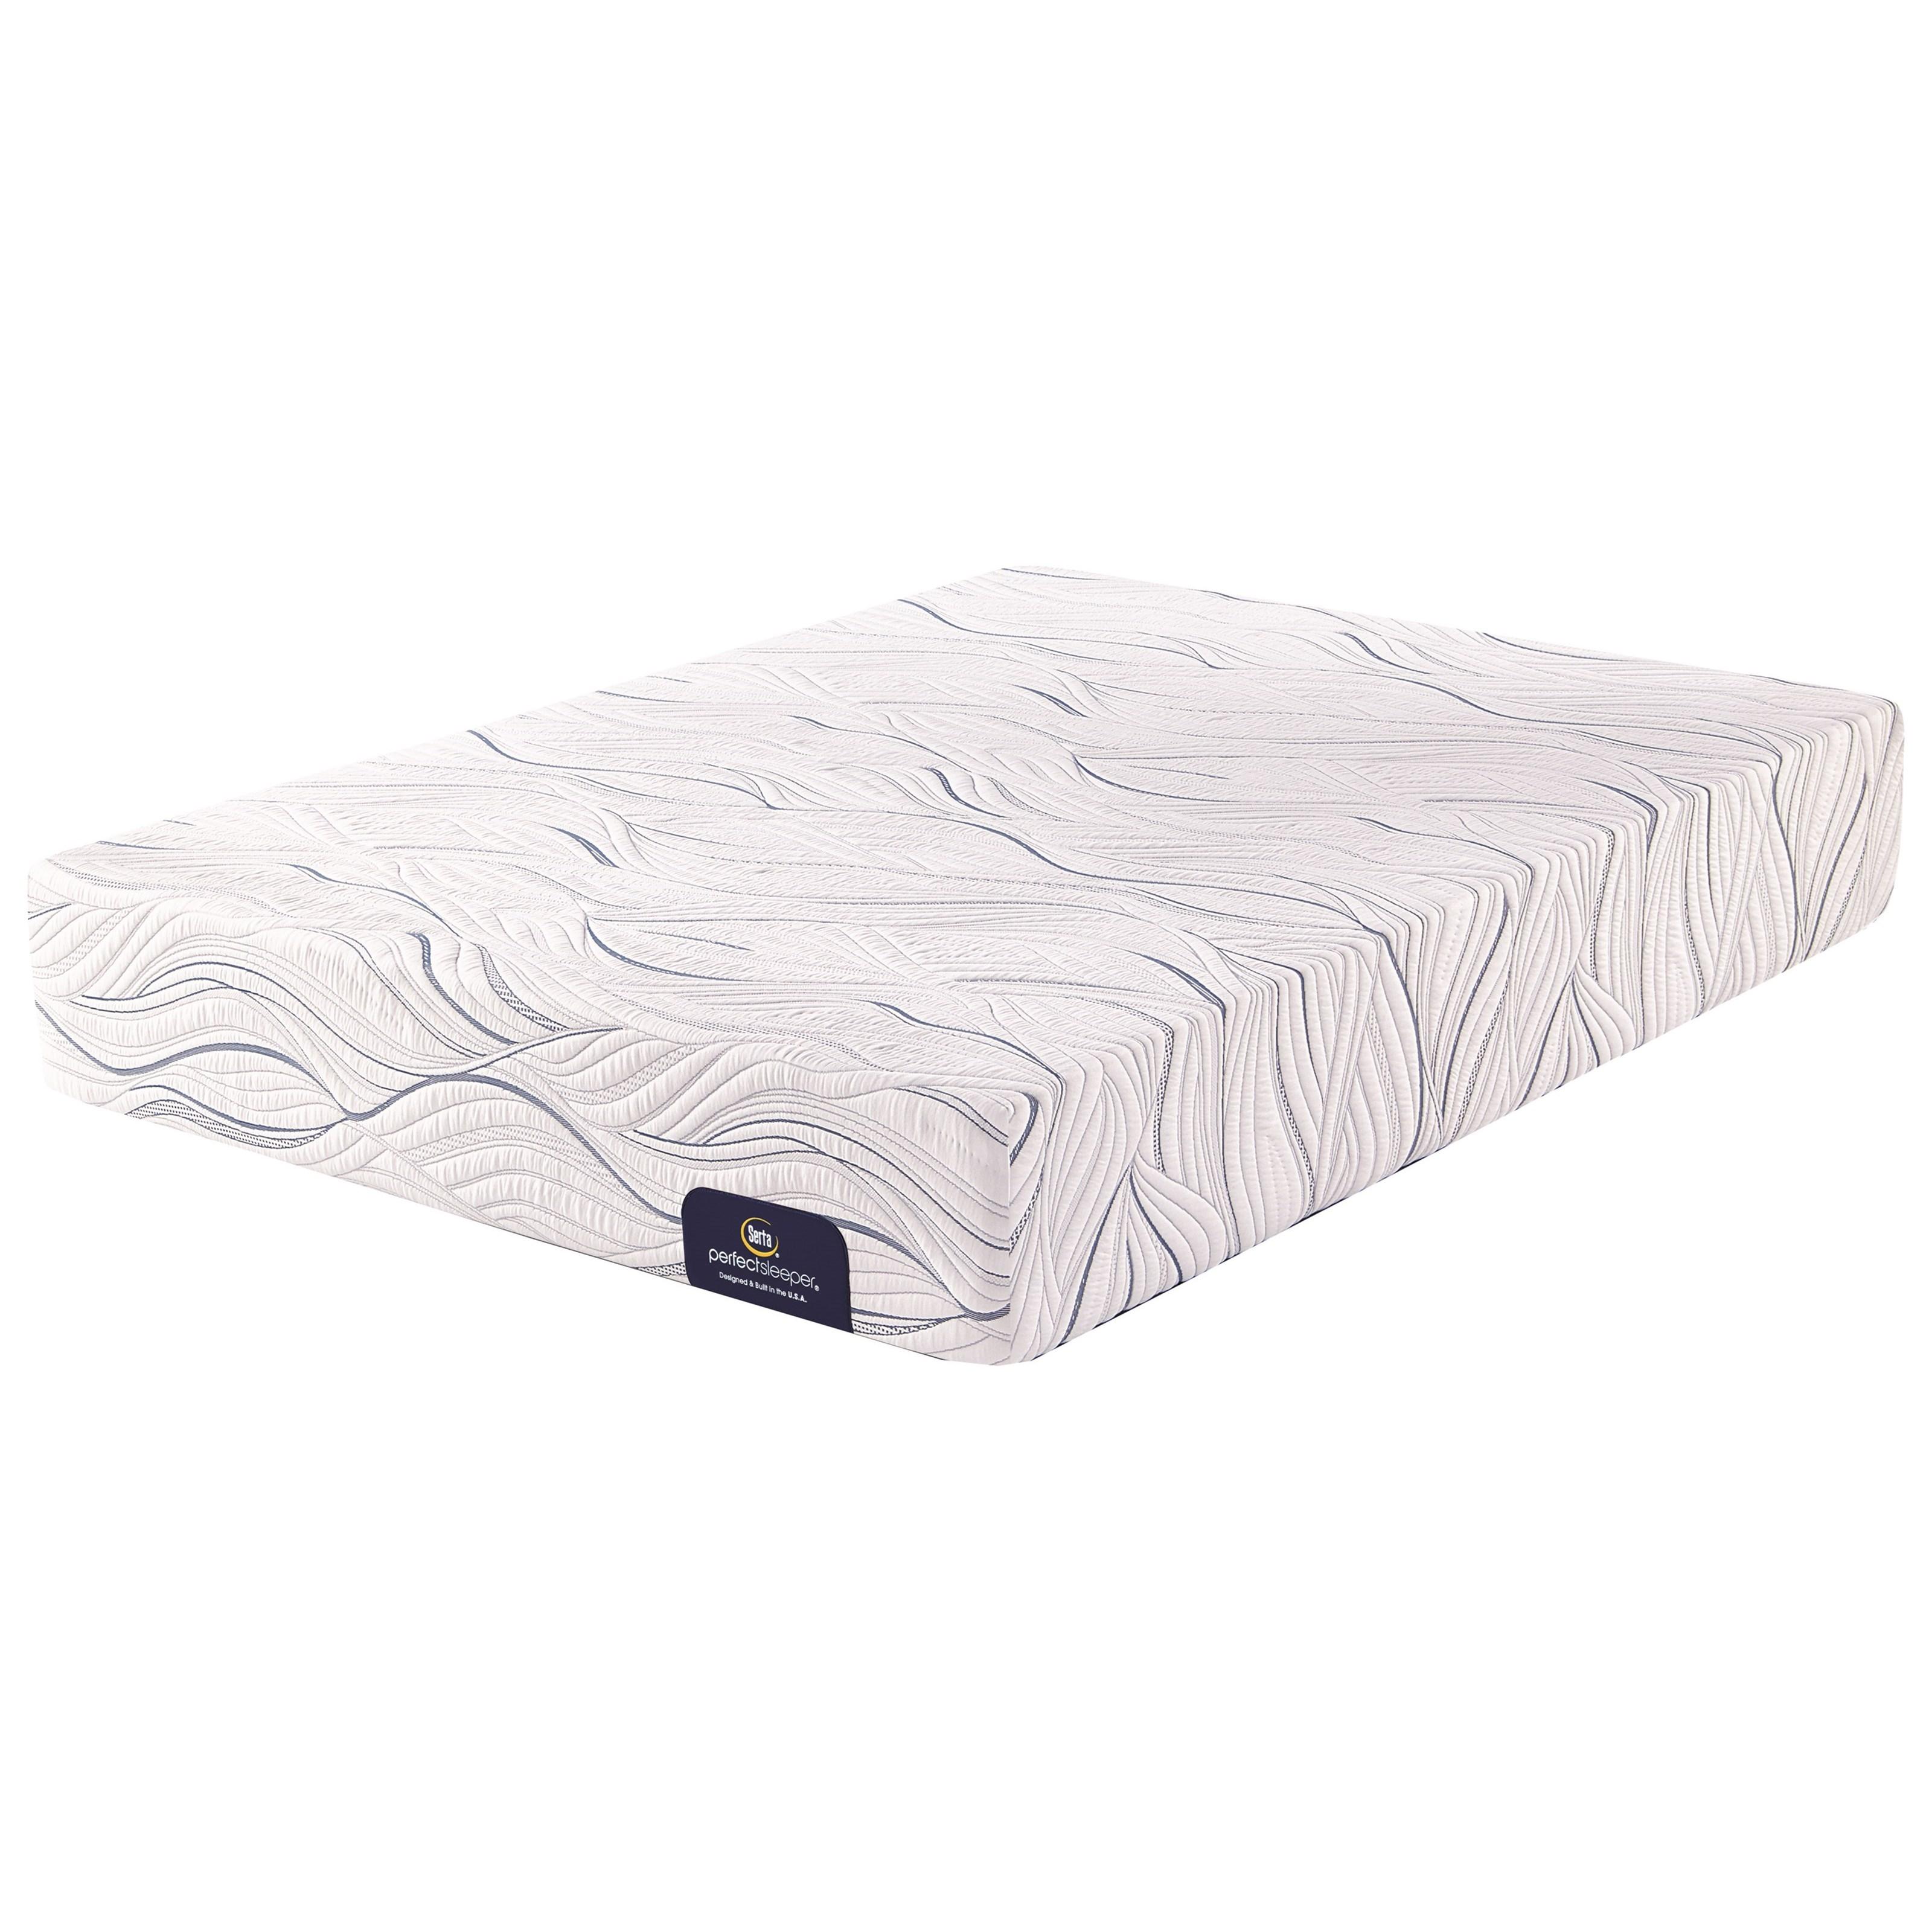 serta ps carriage hill plush queen plush gel memory foam mattress - Serta Memory Foam Mattress